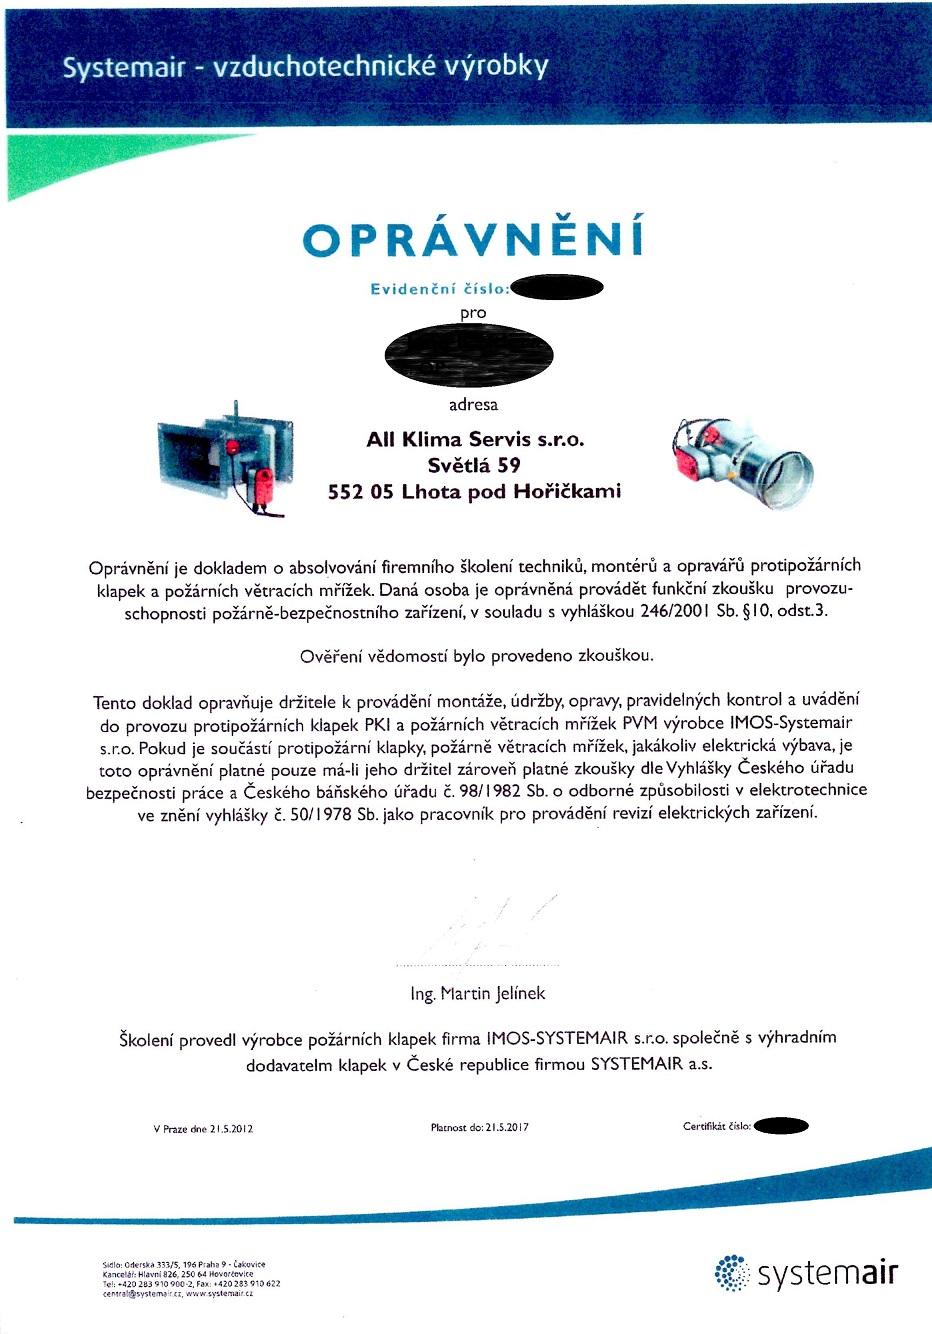 PKl a PVM IMOS-Systemair s.r.o.